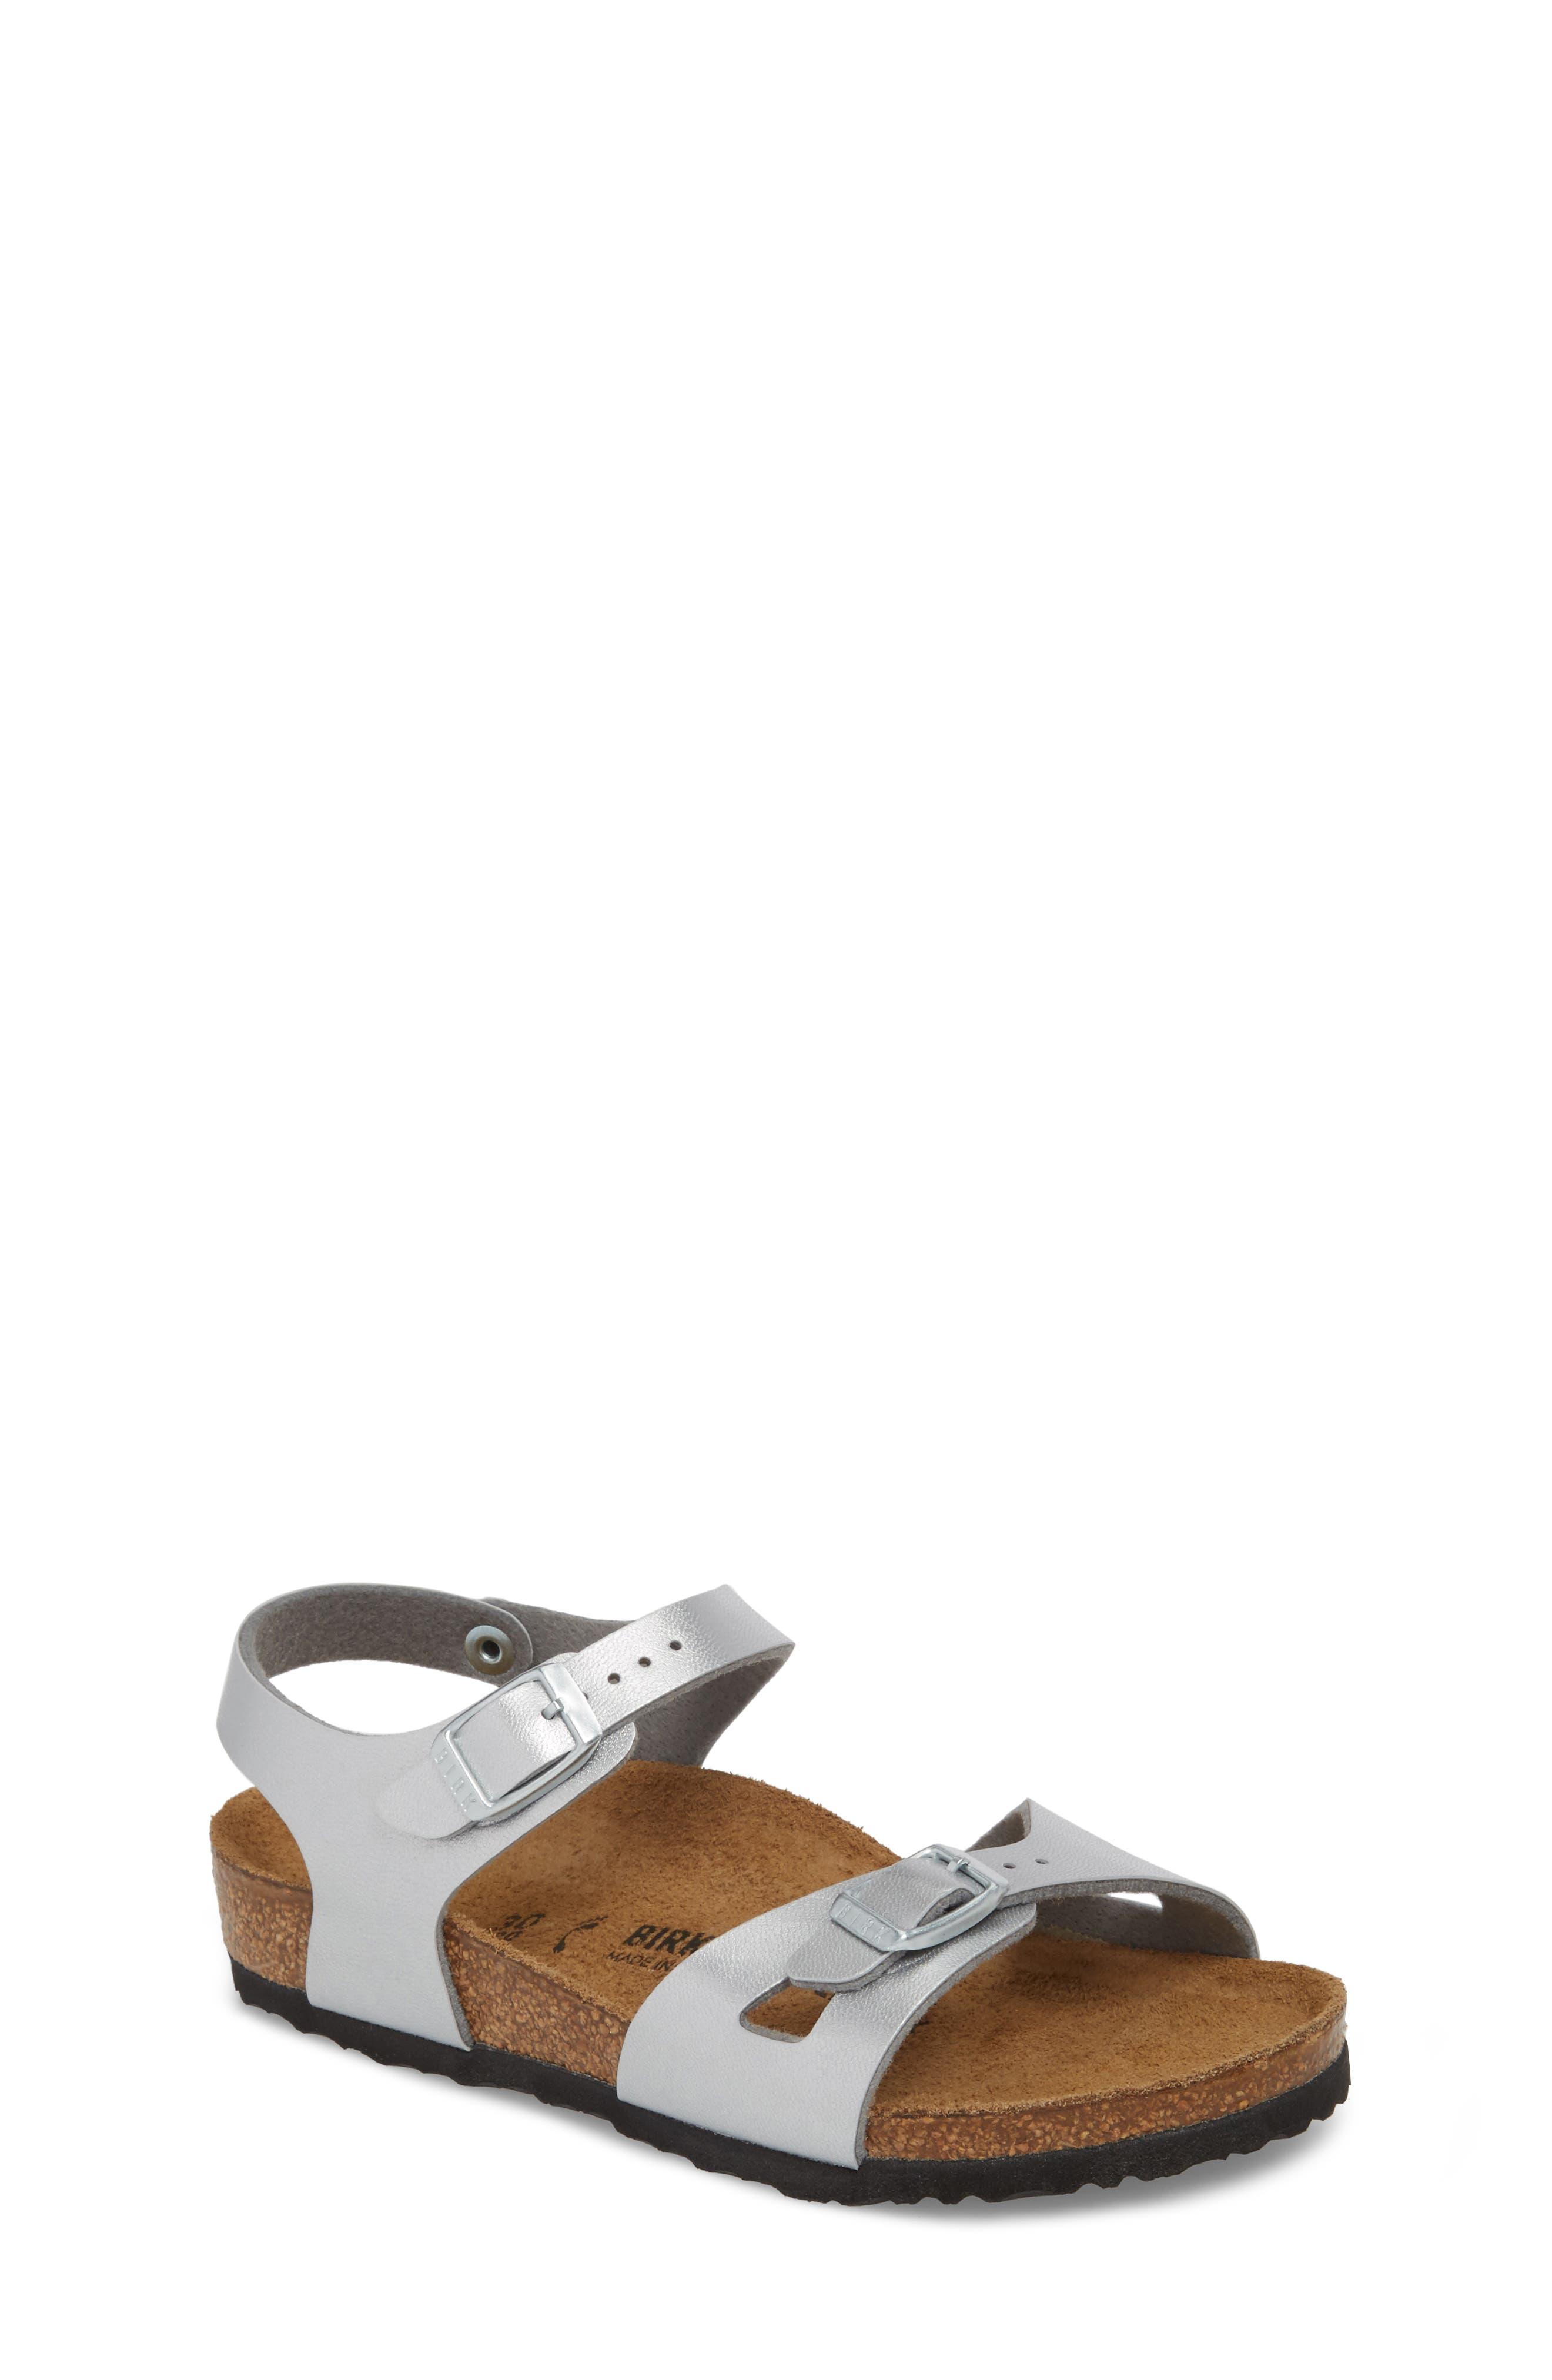 Birkenstock Rio Metallic Sandal (Walker & Toddler)